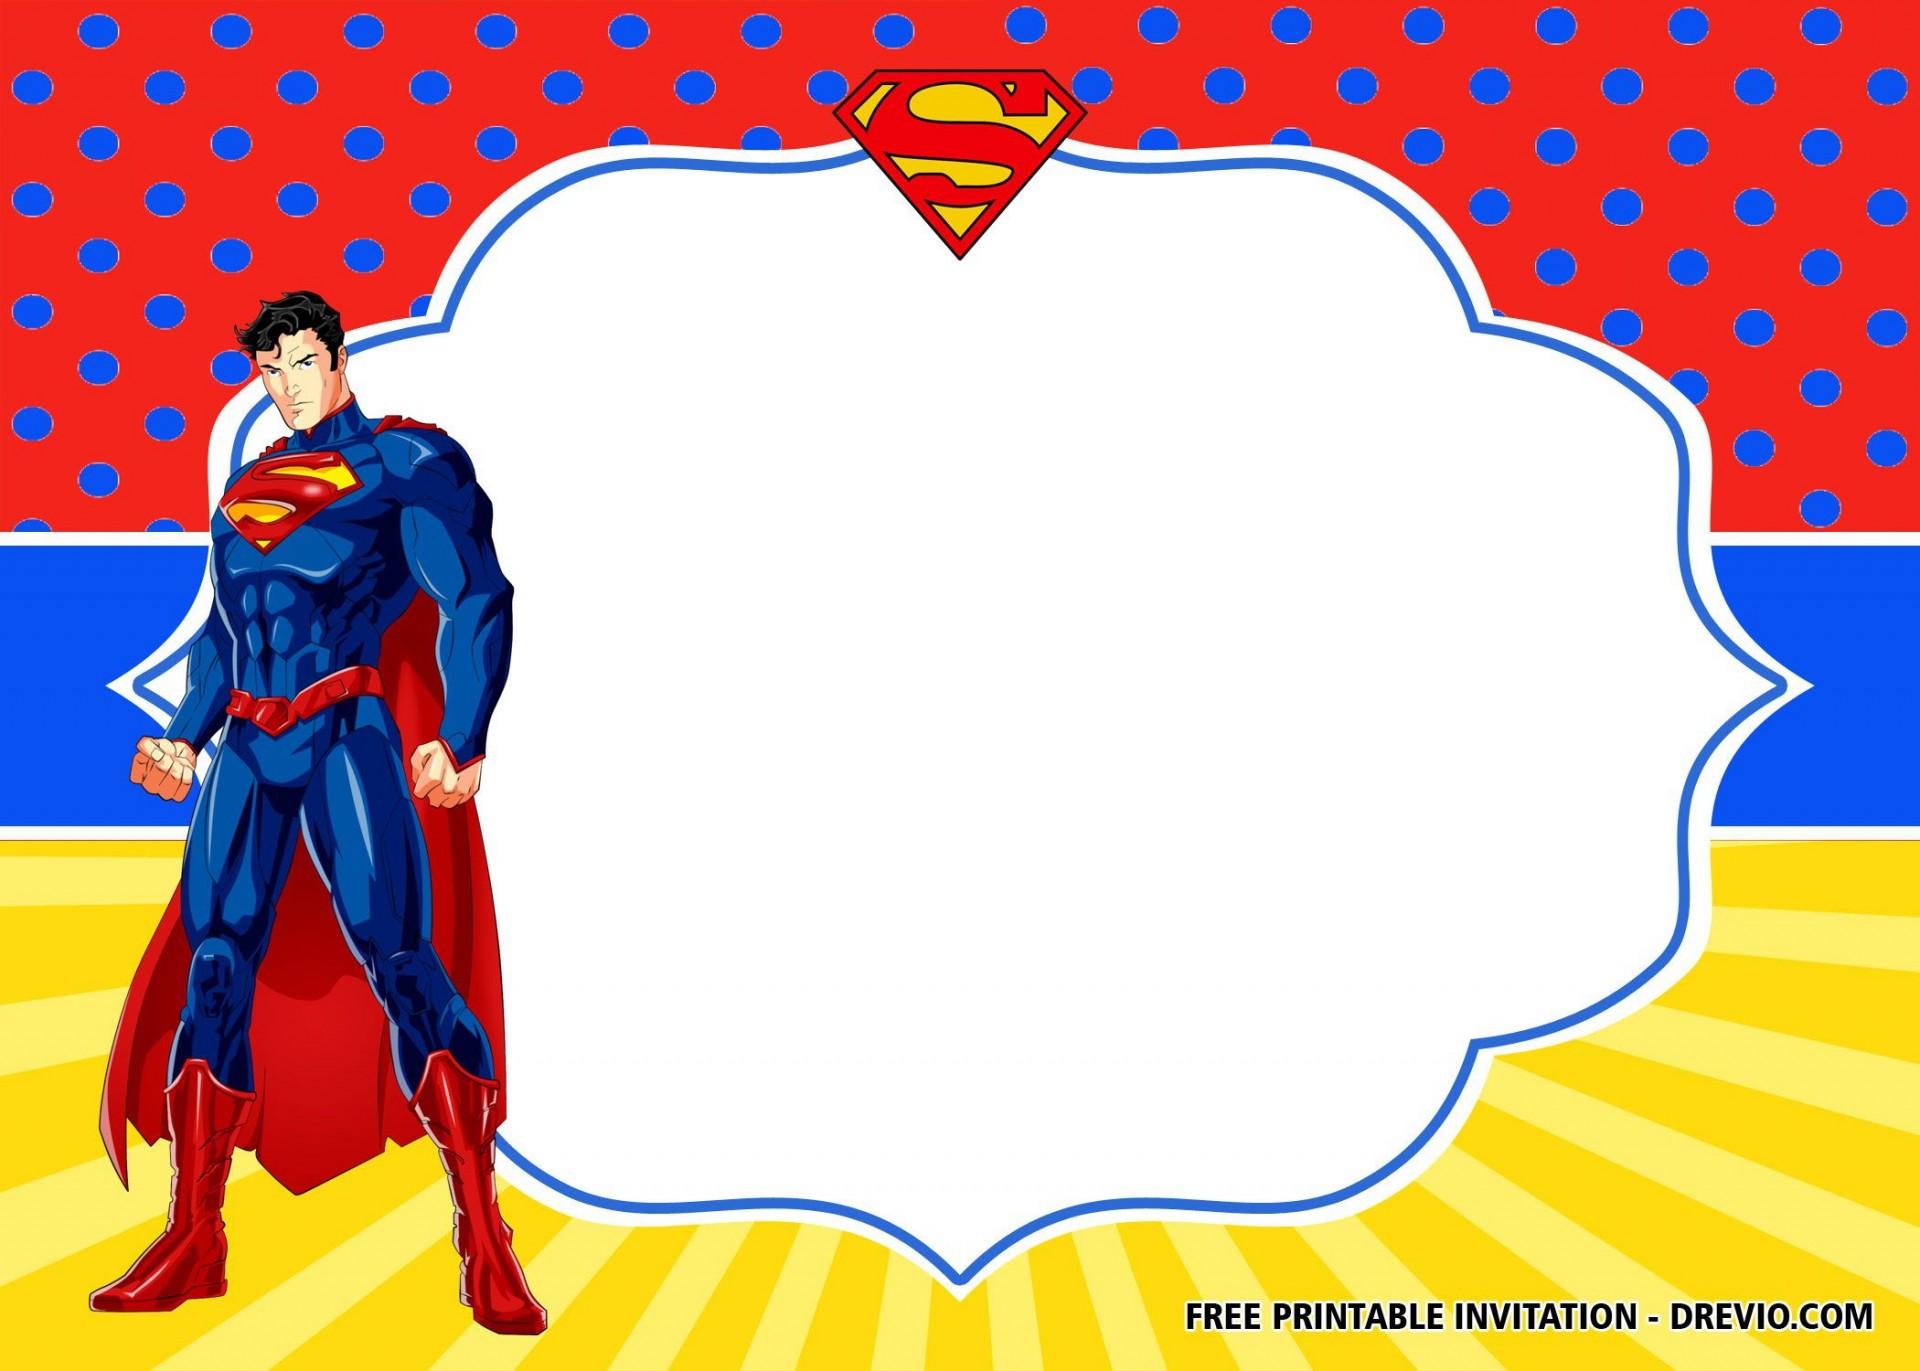 009 Impressive Superhero Birthday Party Invitation Template Free Image  Invite1920